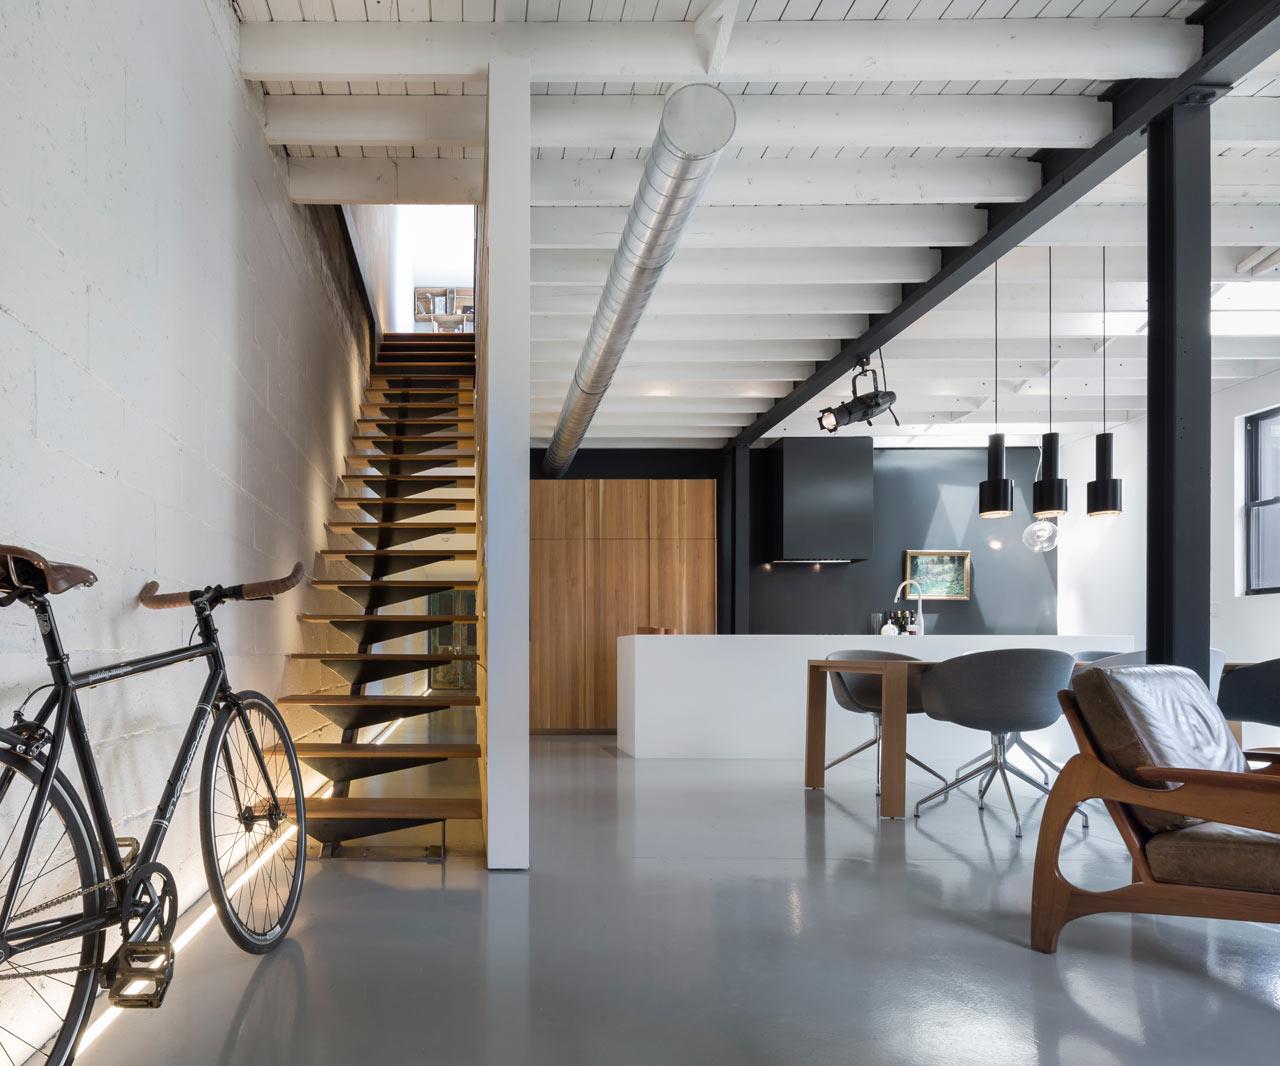 Le-205-House-Atelier-Moderno-1